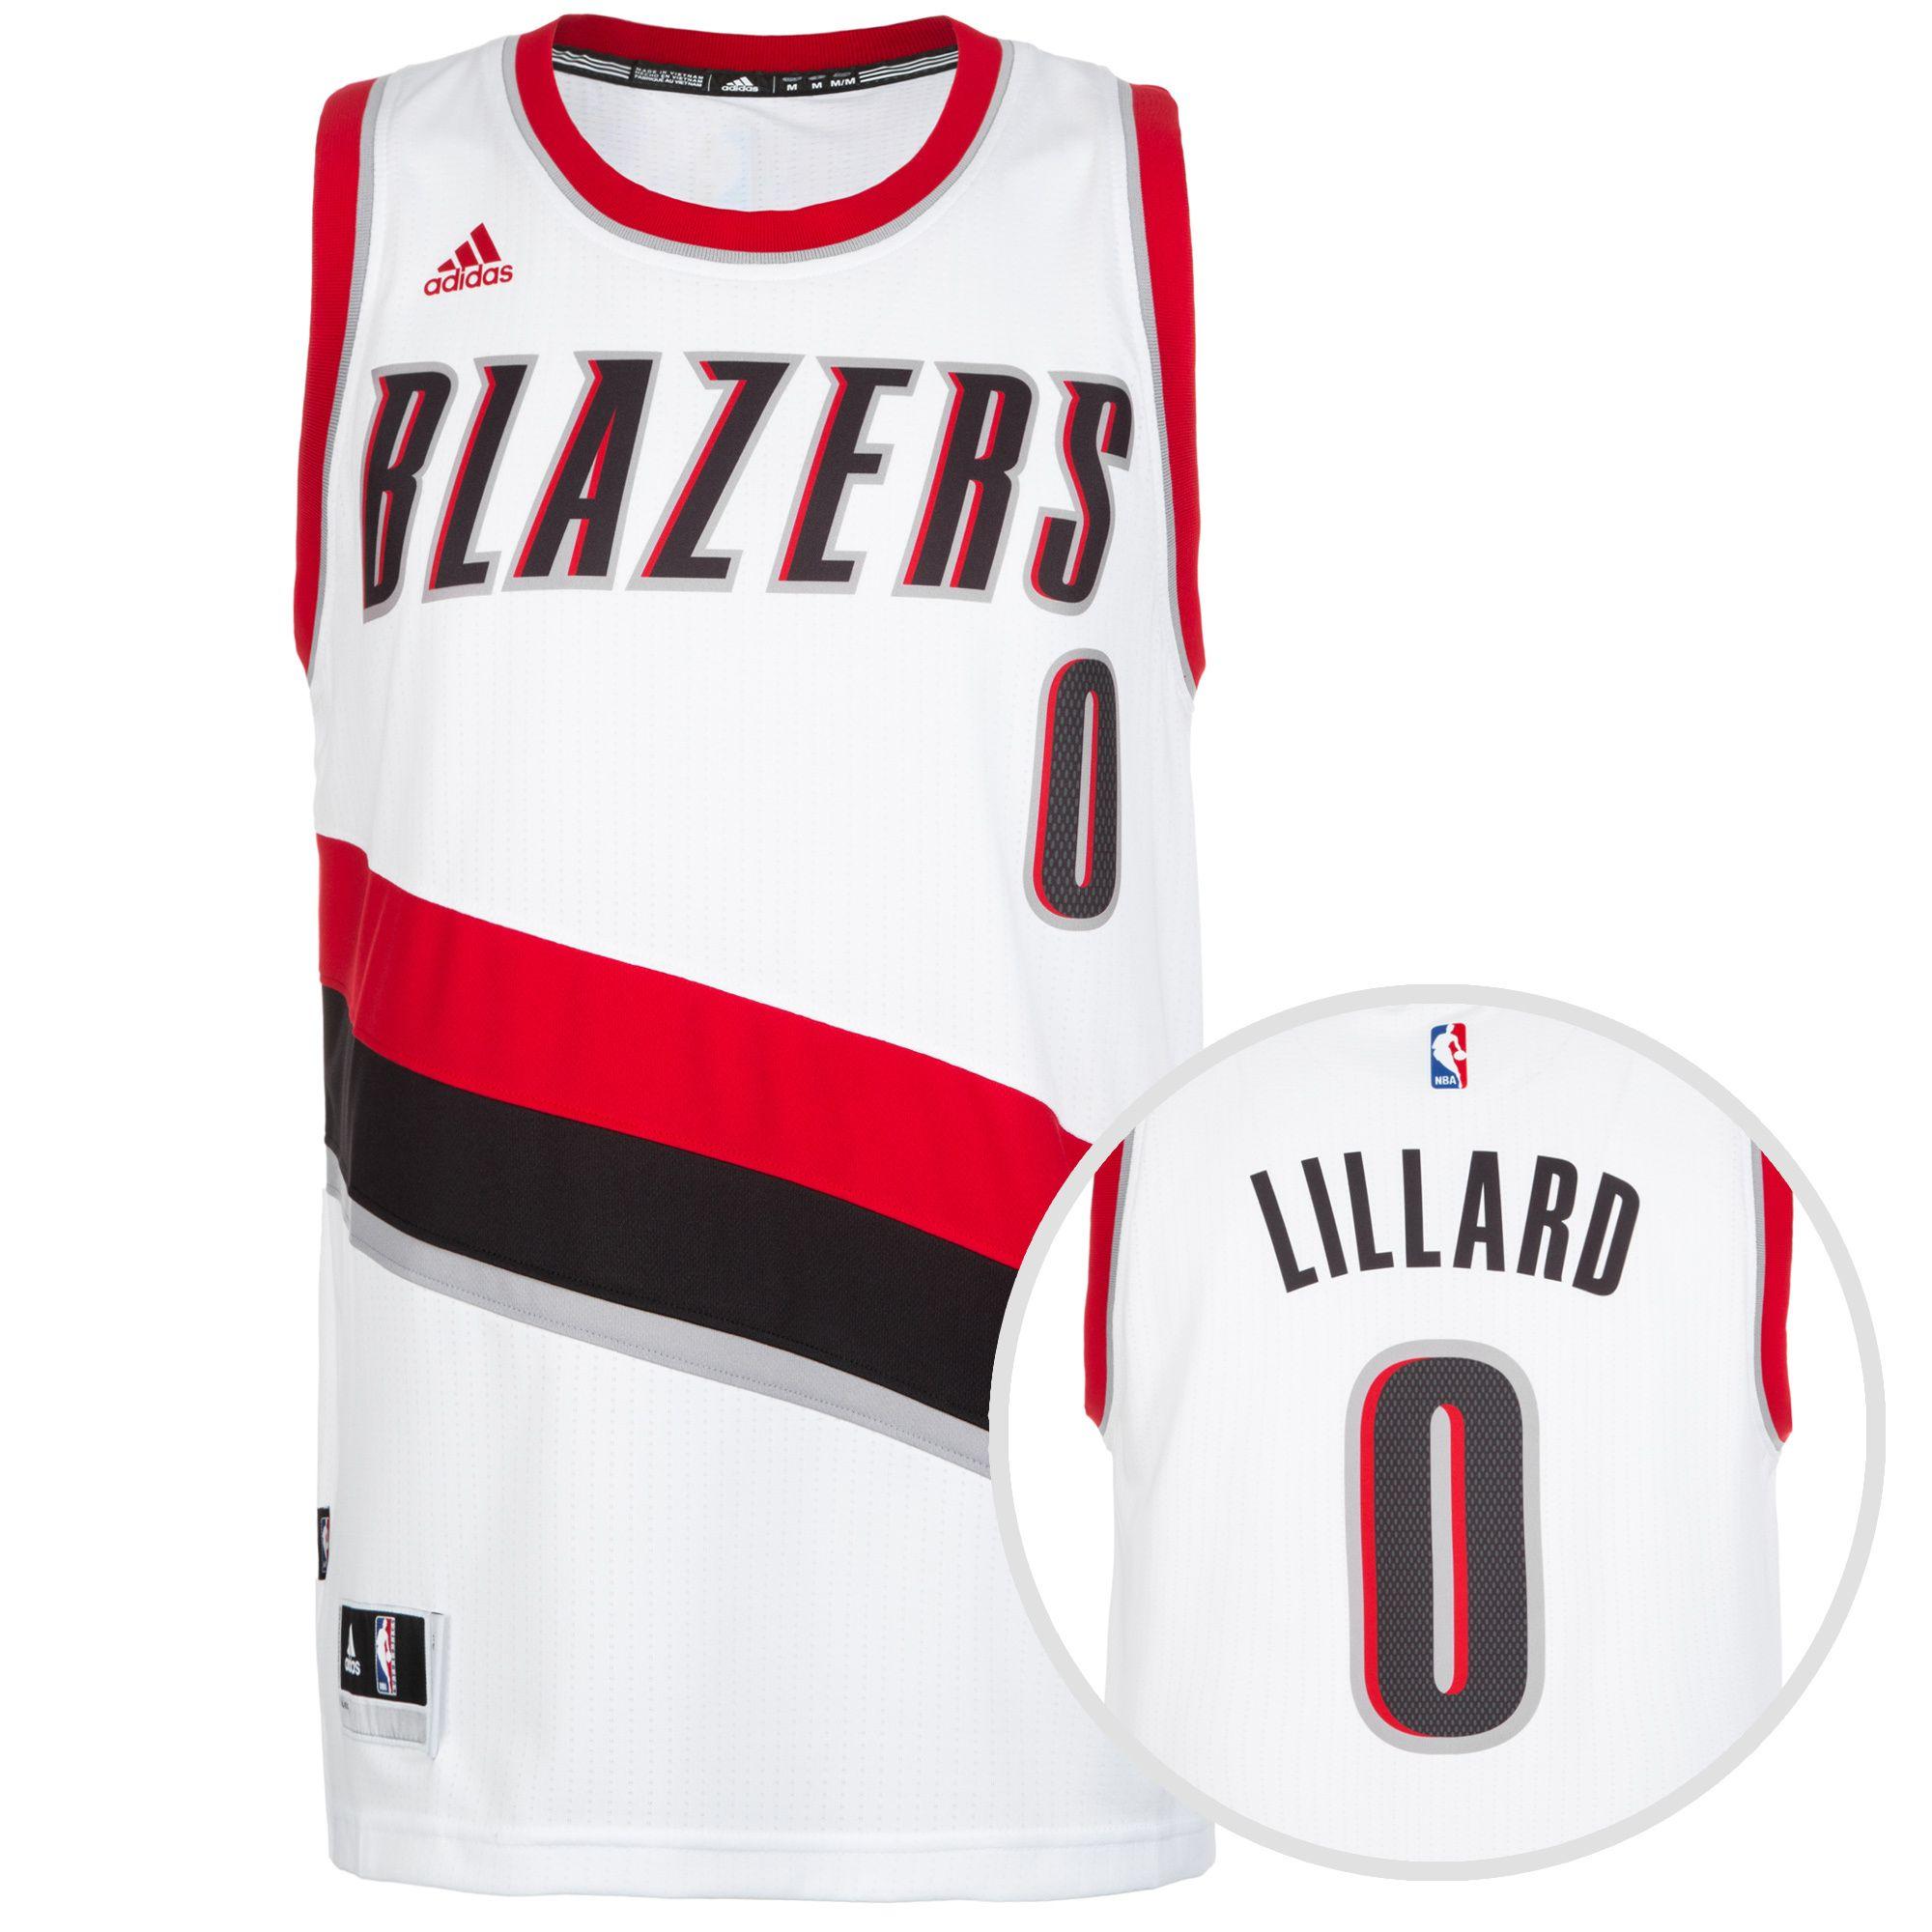 ADIDAS PERFORMANCE adidas Performance Portland Trail Blazers Lillard Swingman Basketballtrikot Herren